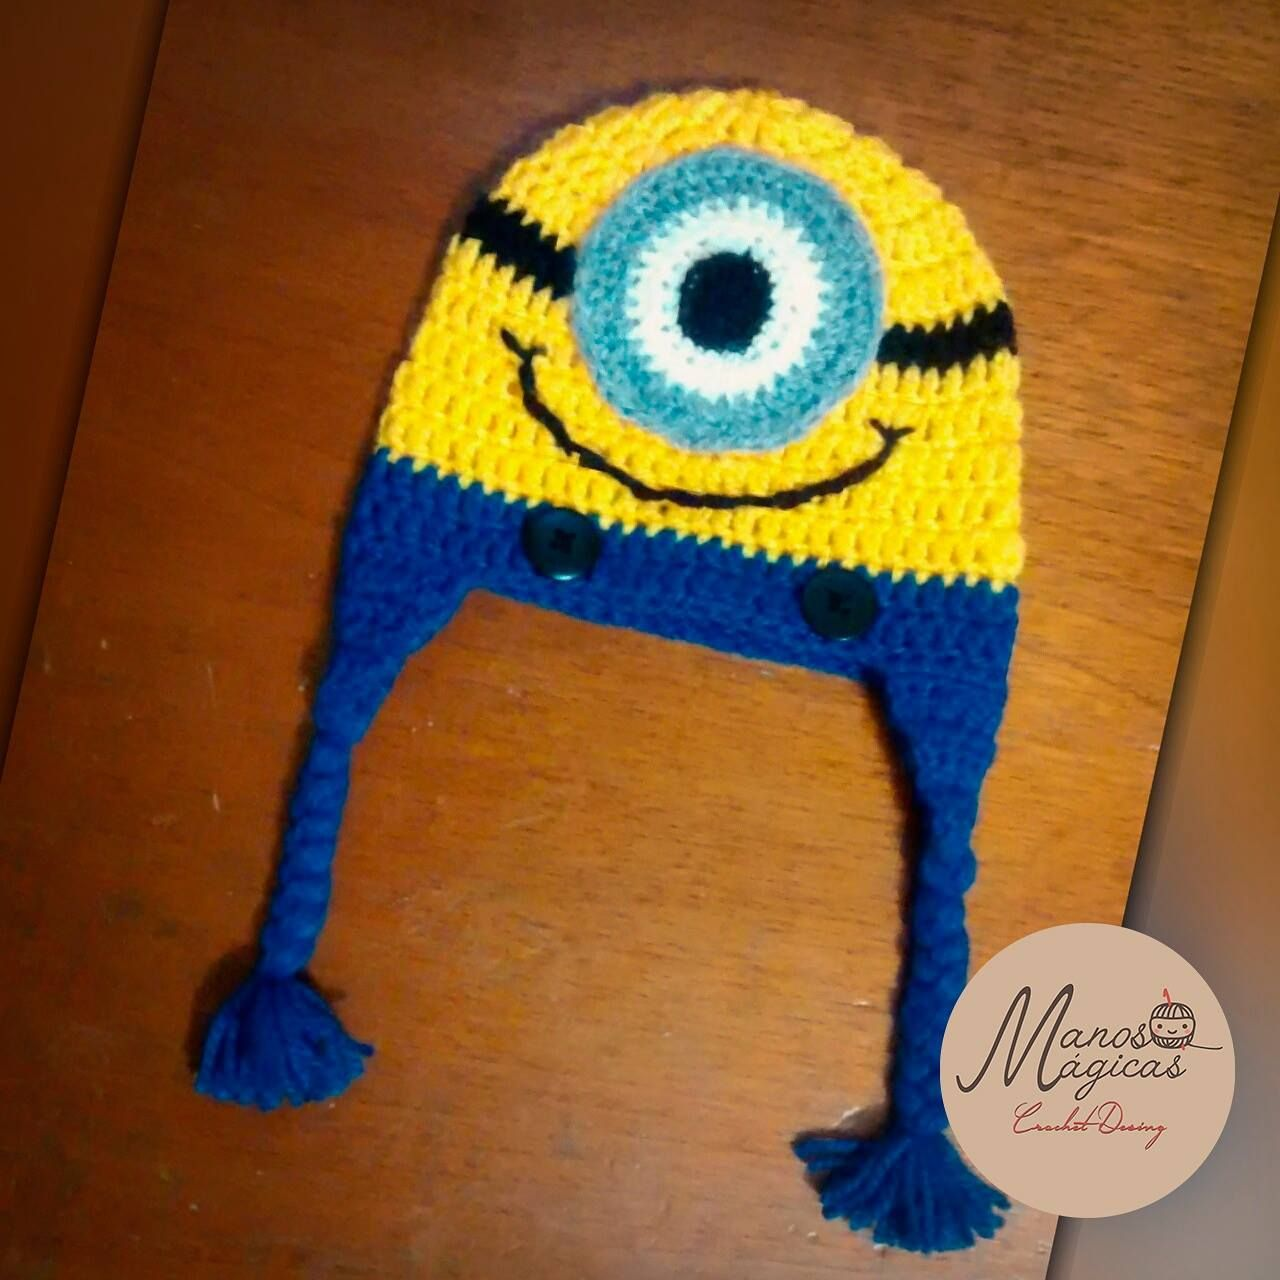 Gorrito Minios Tipo chullo a crochet.